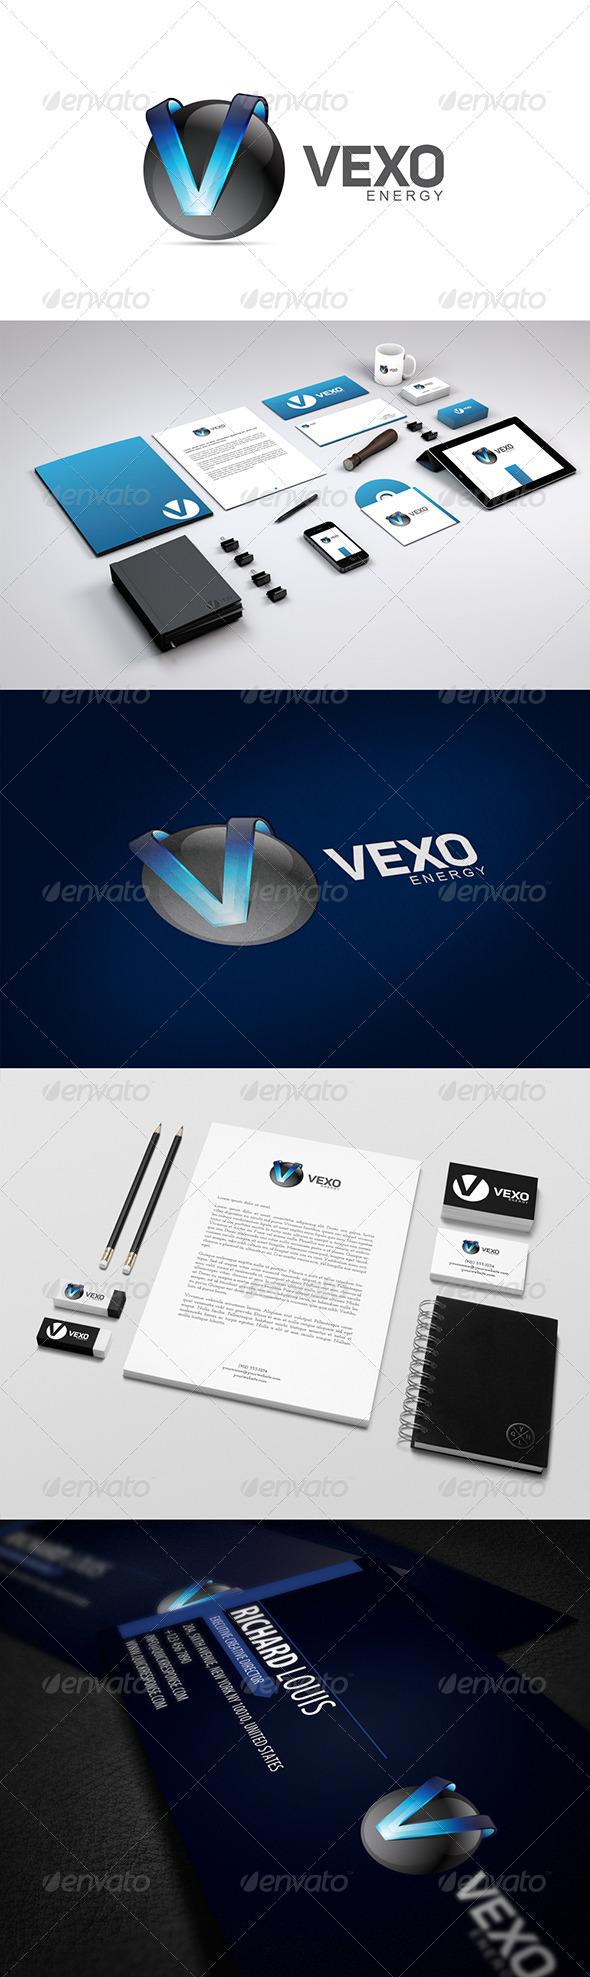 Vexo - 3d Abstract